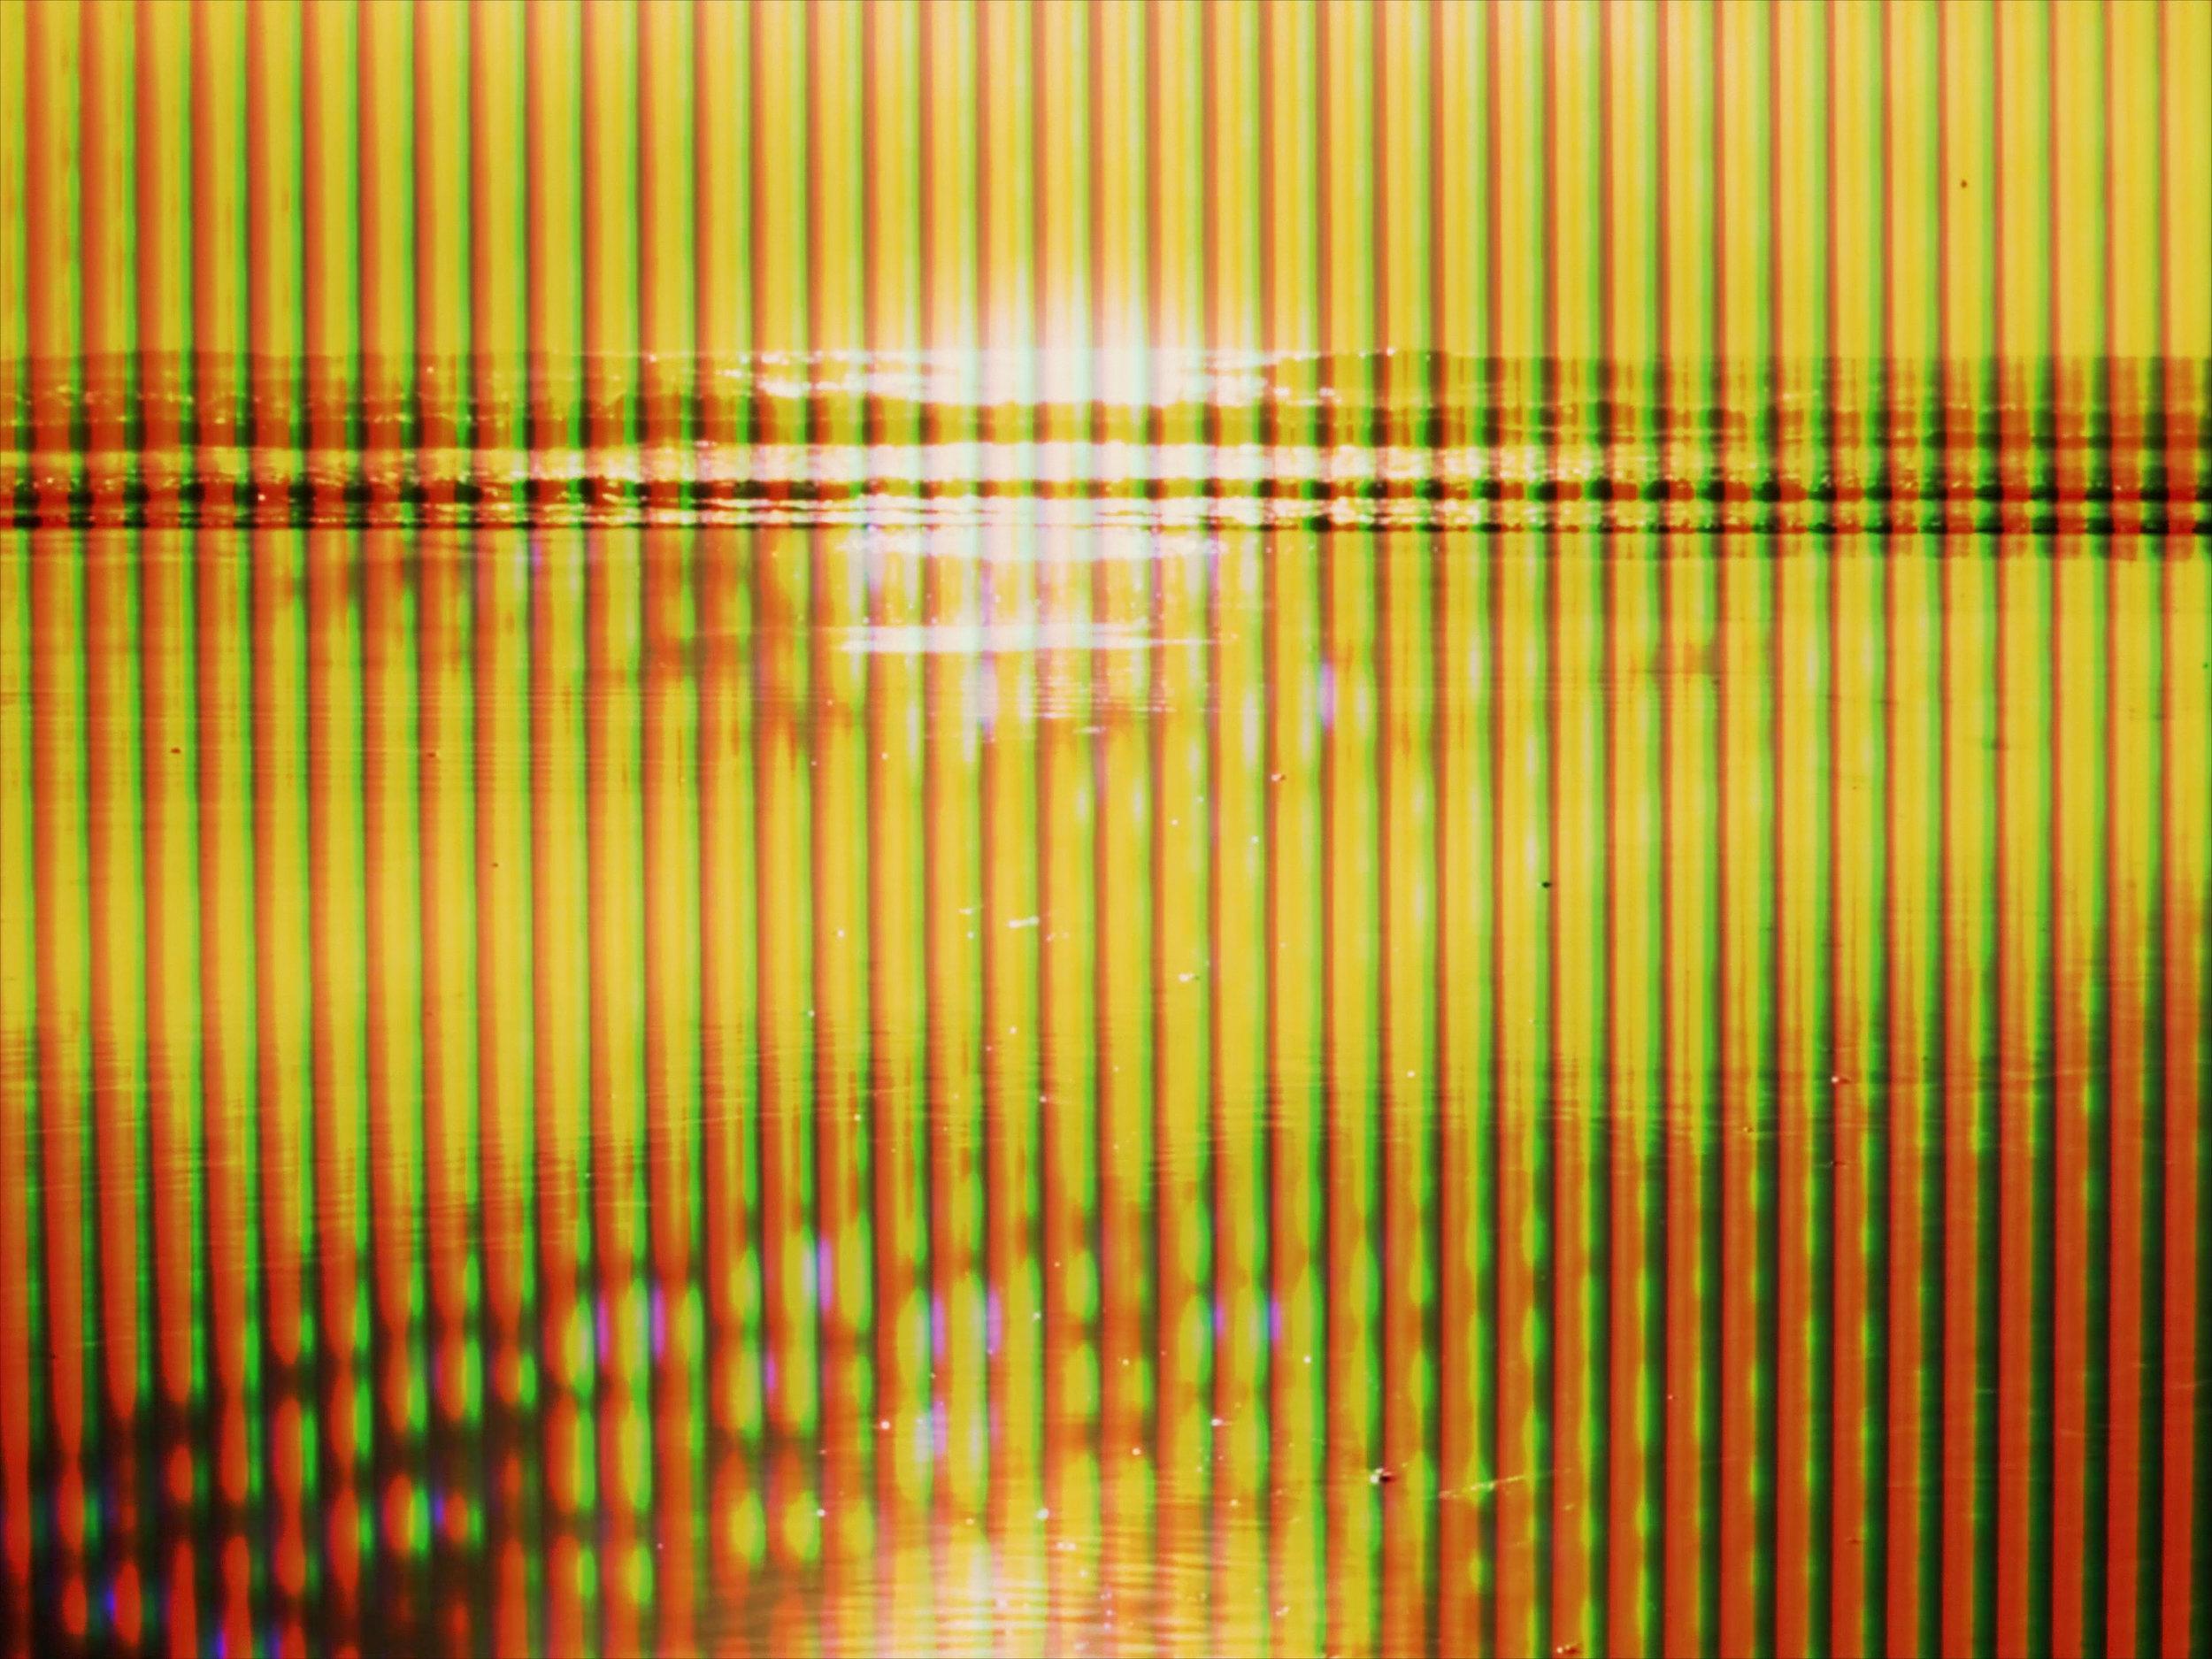 golden chorale %22ocean 3%22 02.jpg